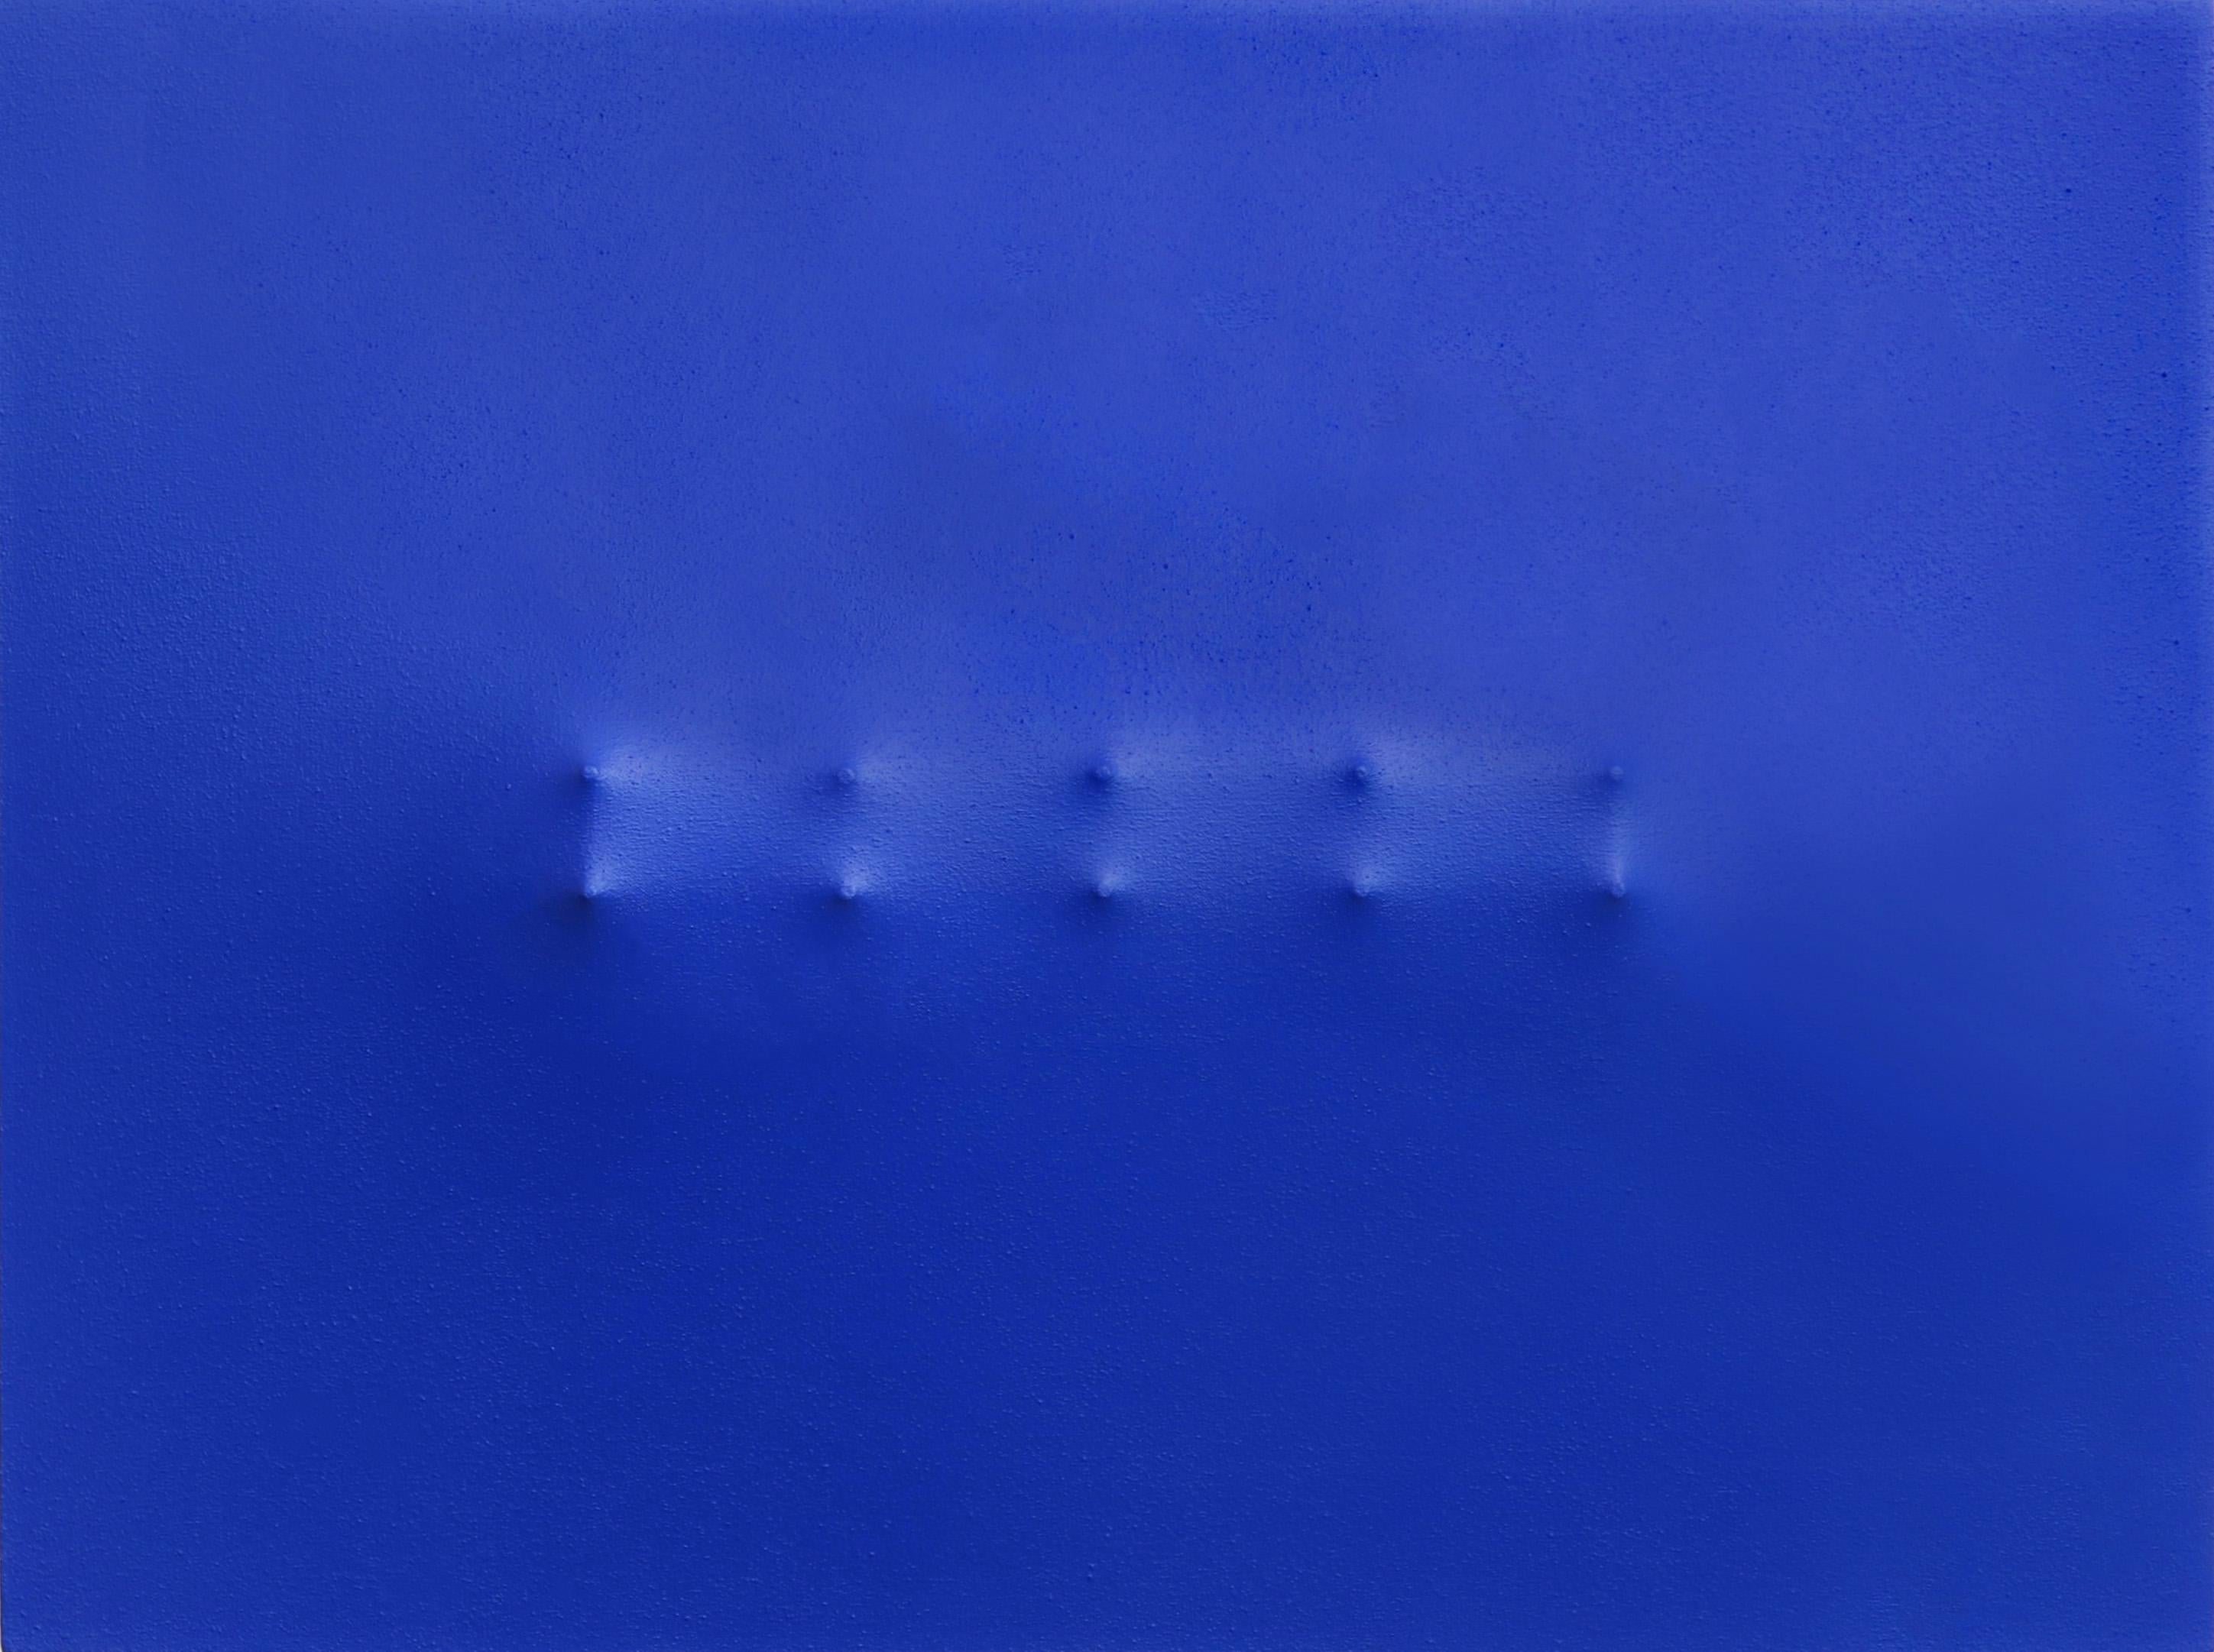 Montana -  Minimalist Dimensional Original Artwork